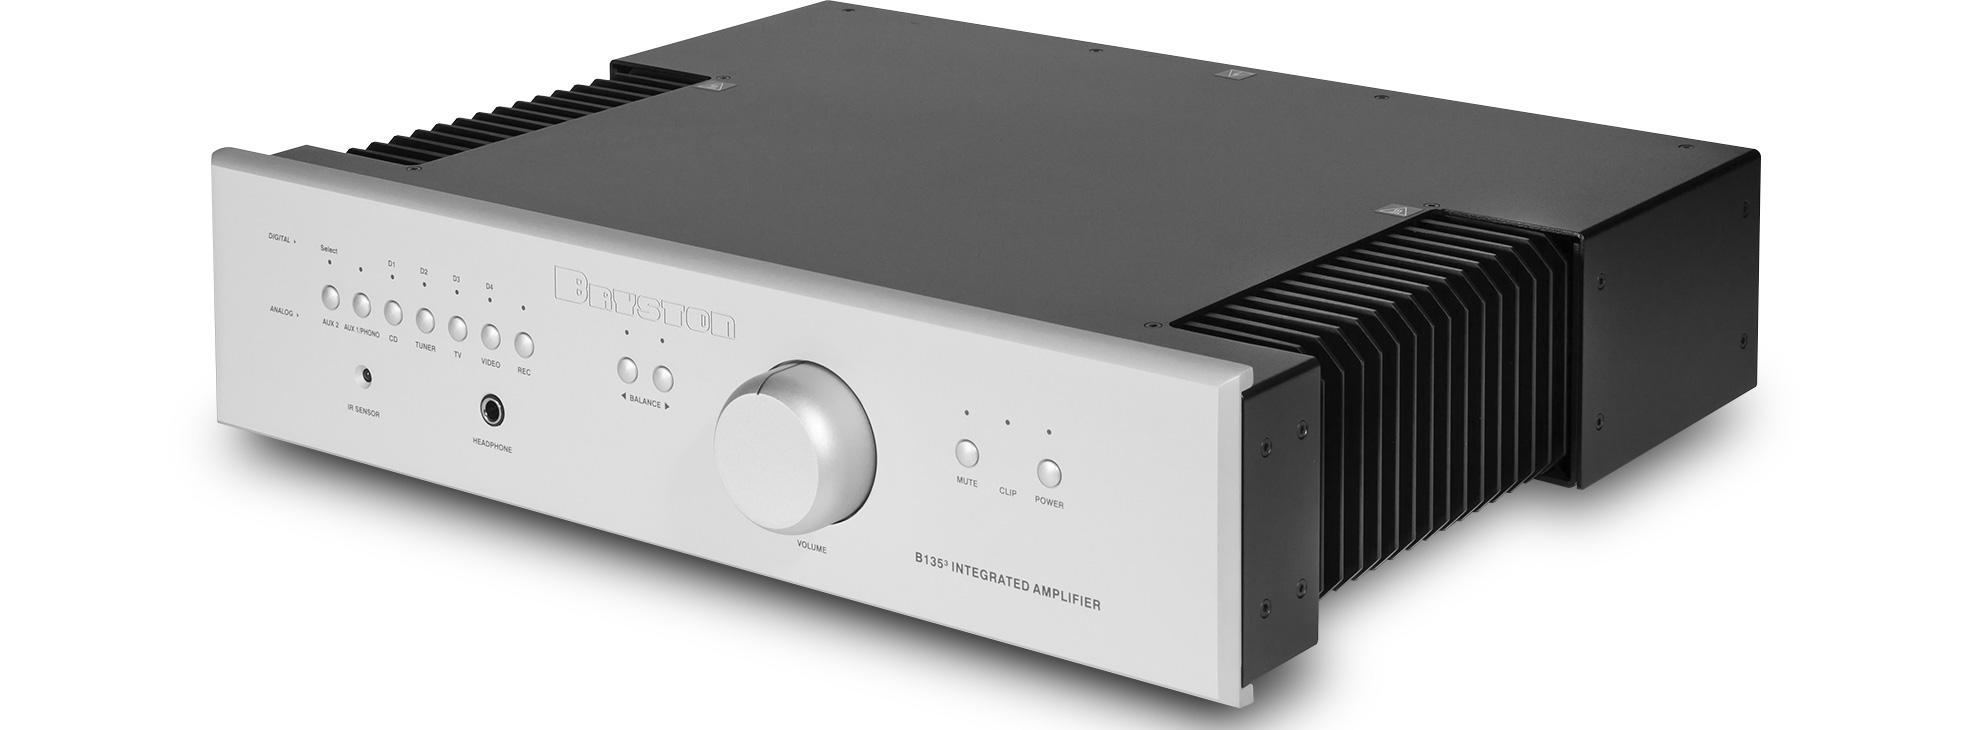 bryston-b135-integrated-stereo-audio-amplifier-banner.jpg